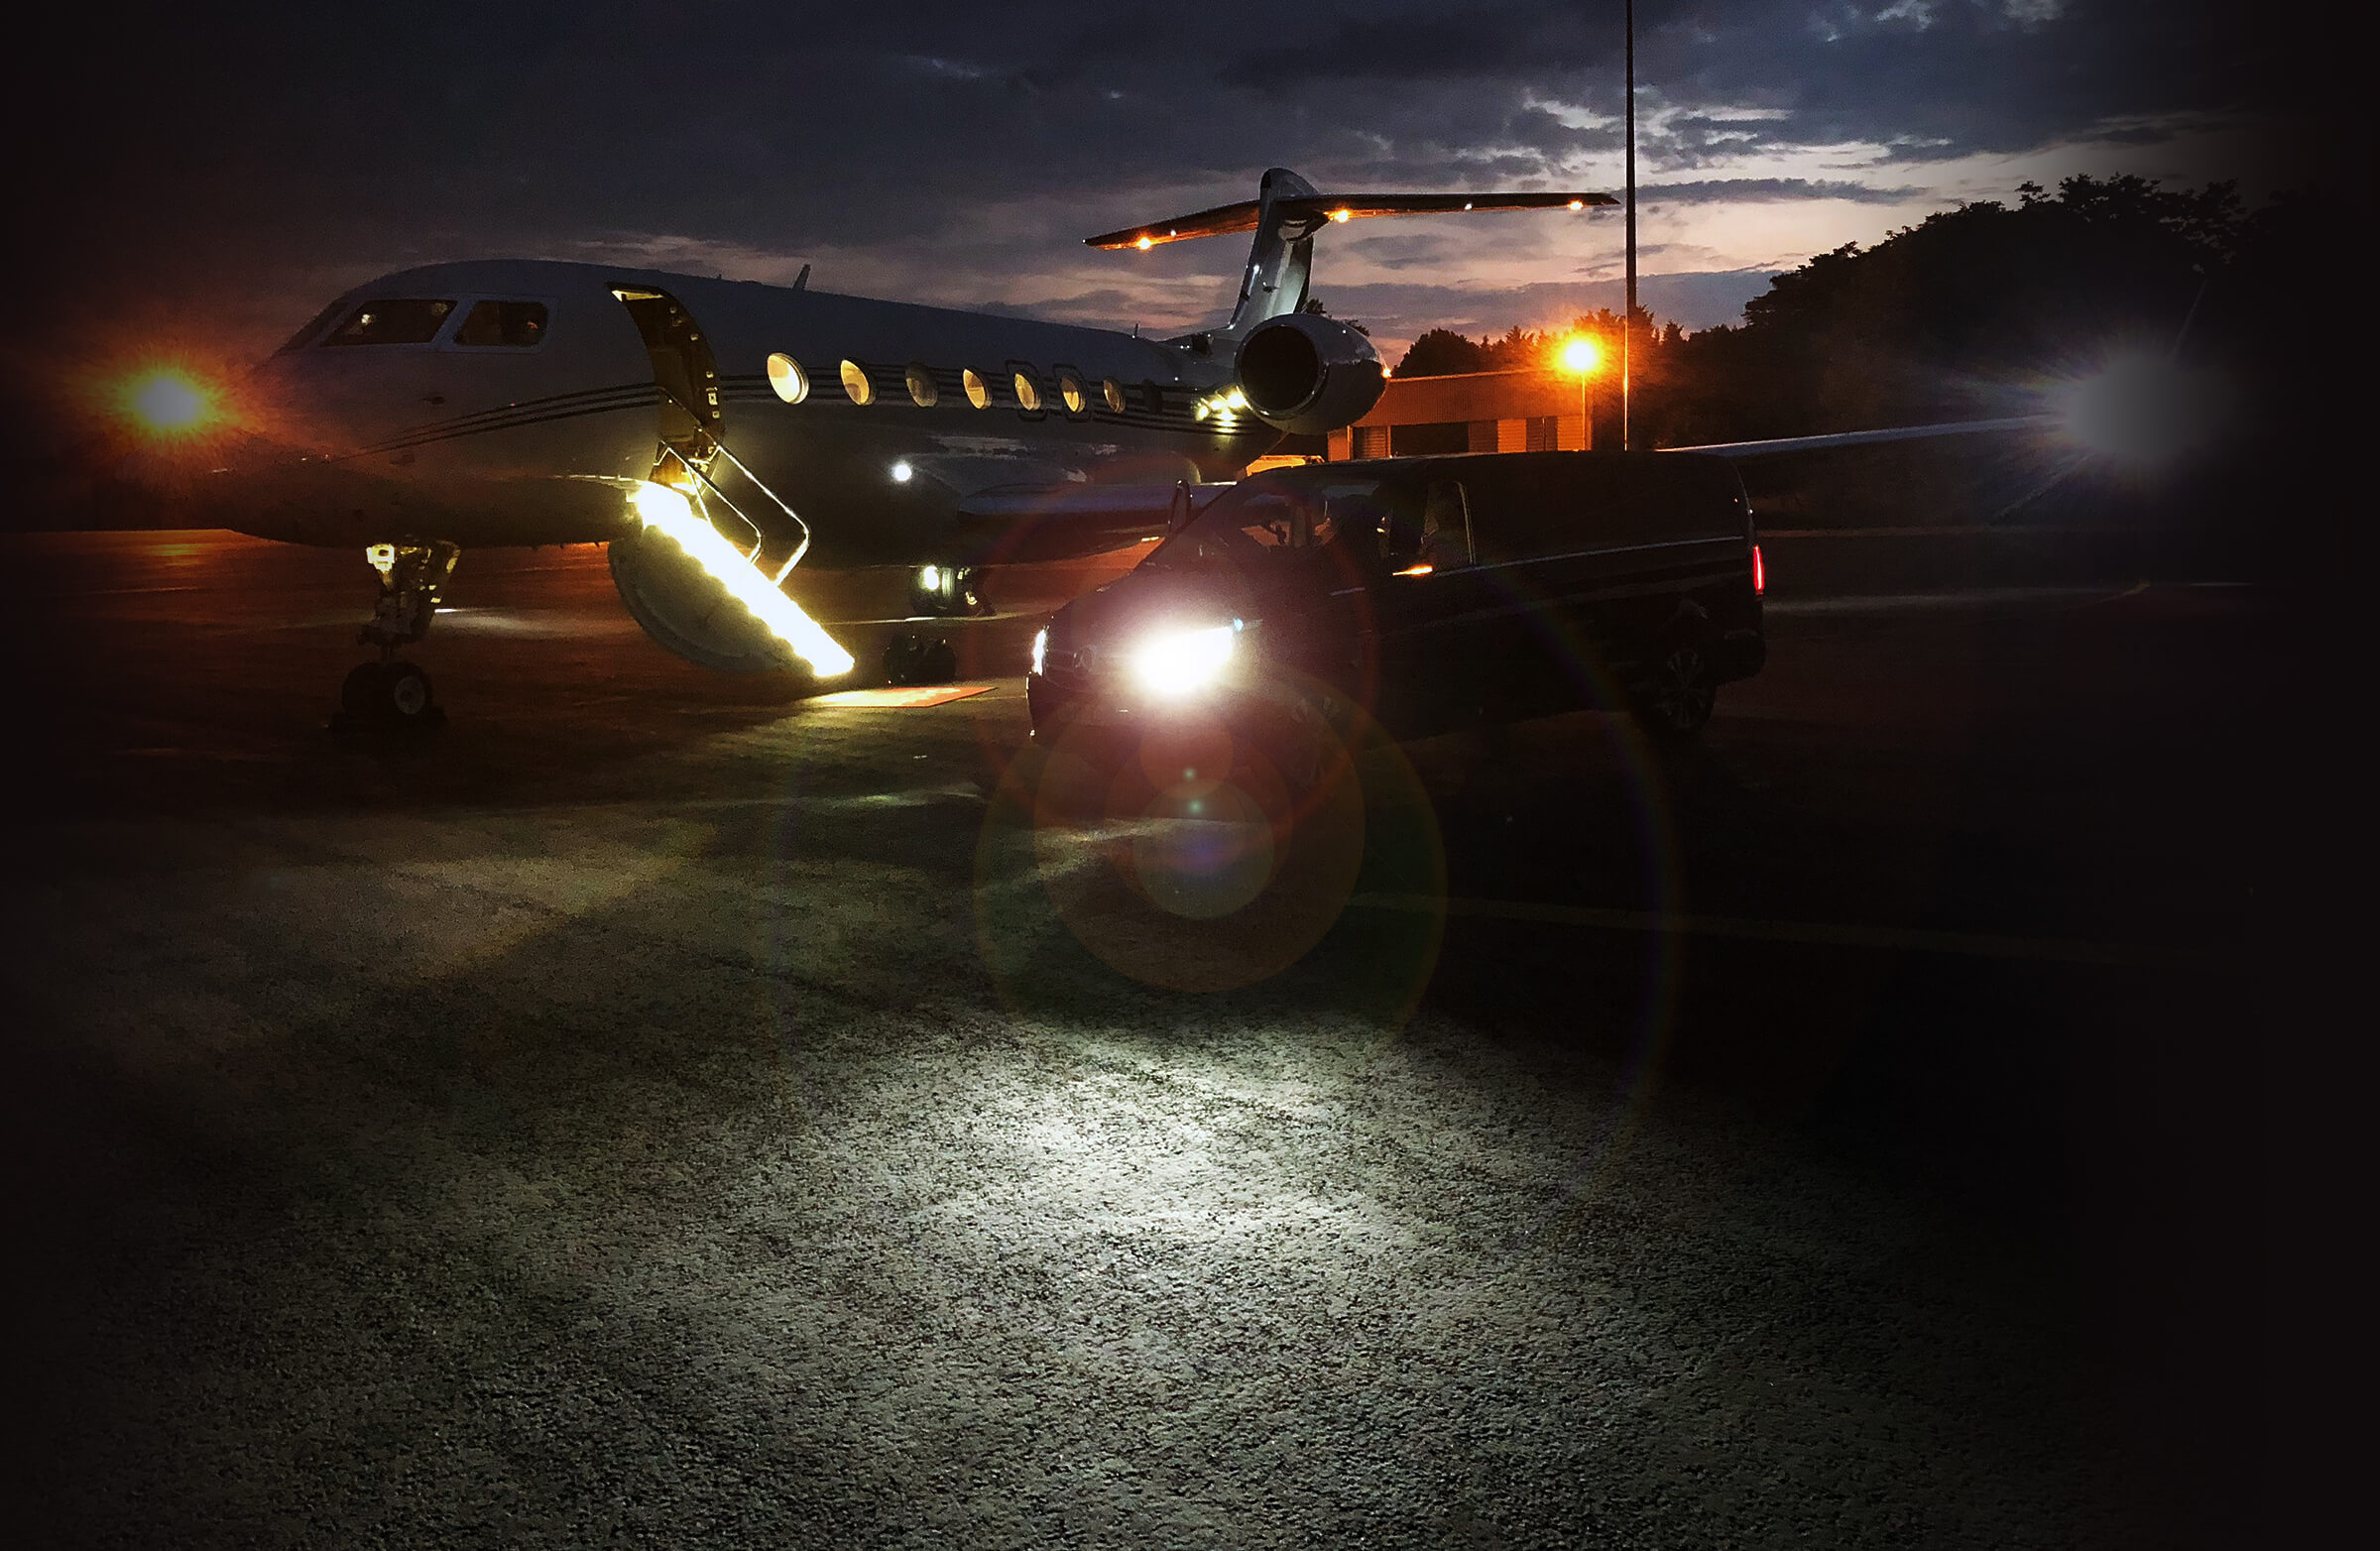 bourgogne-discovery-transport-prive-de-personne-liaison-aeroport-dijon-bourgogne-france-franche-comte-avion-jet-prive-aeroport-dijon-tavaux